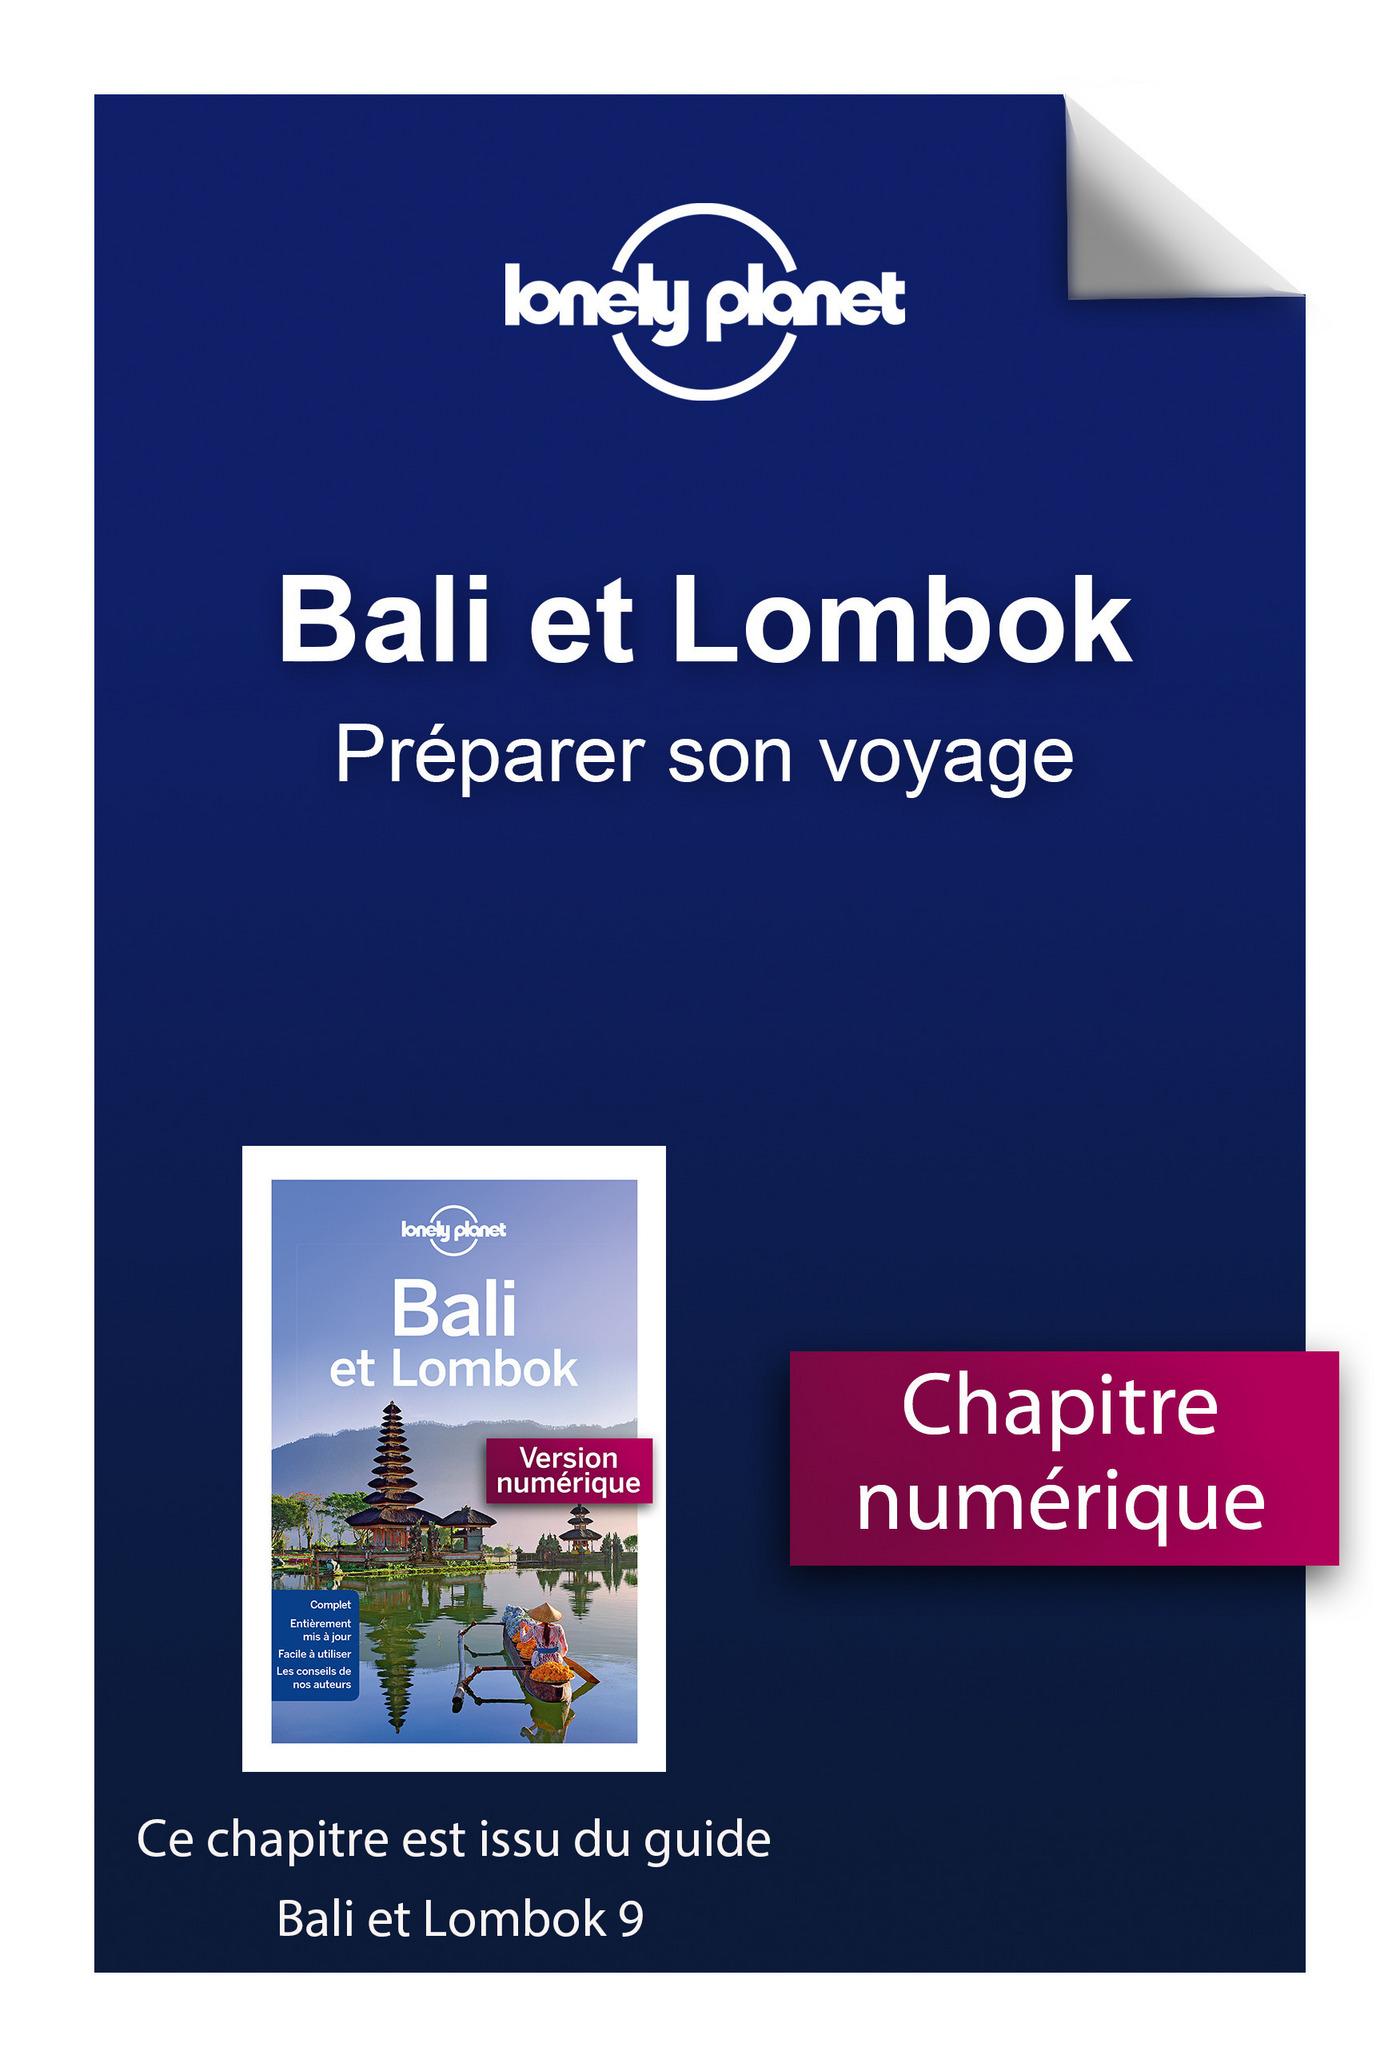 Bali et Lombok 9 - Préparer son voyage